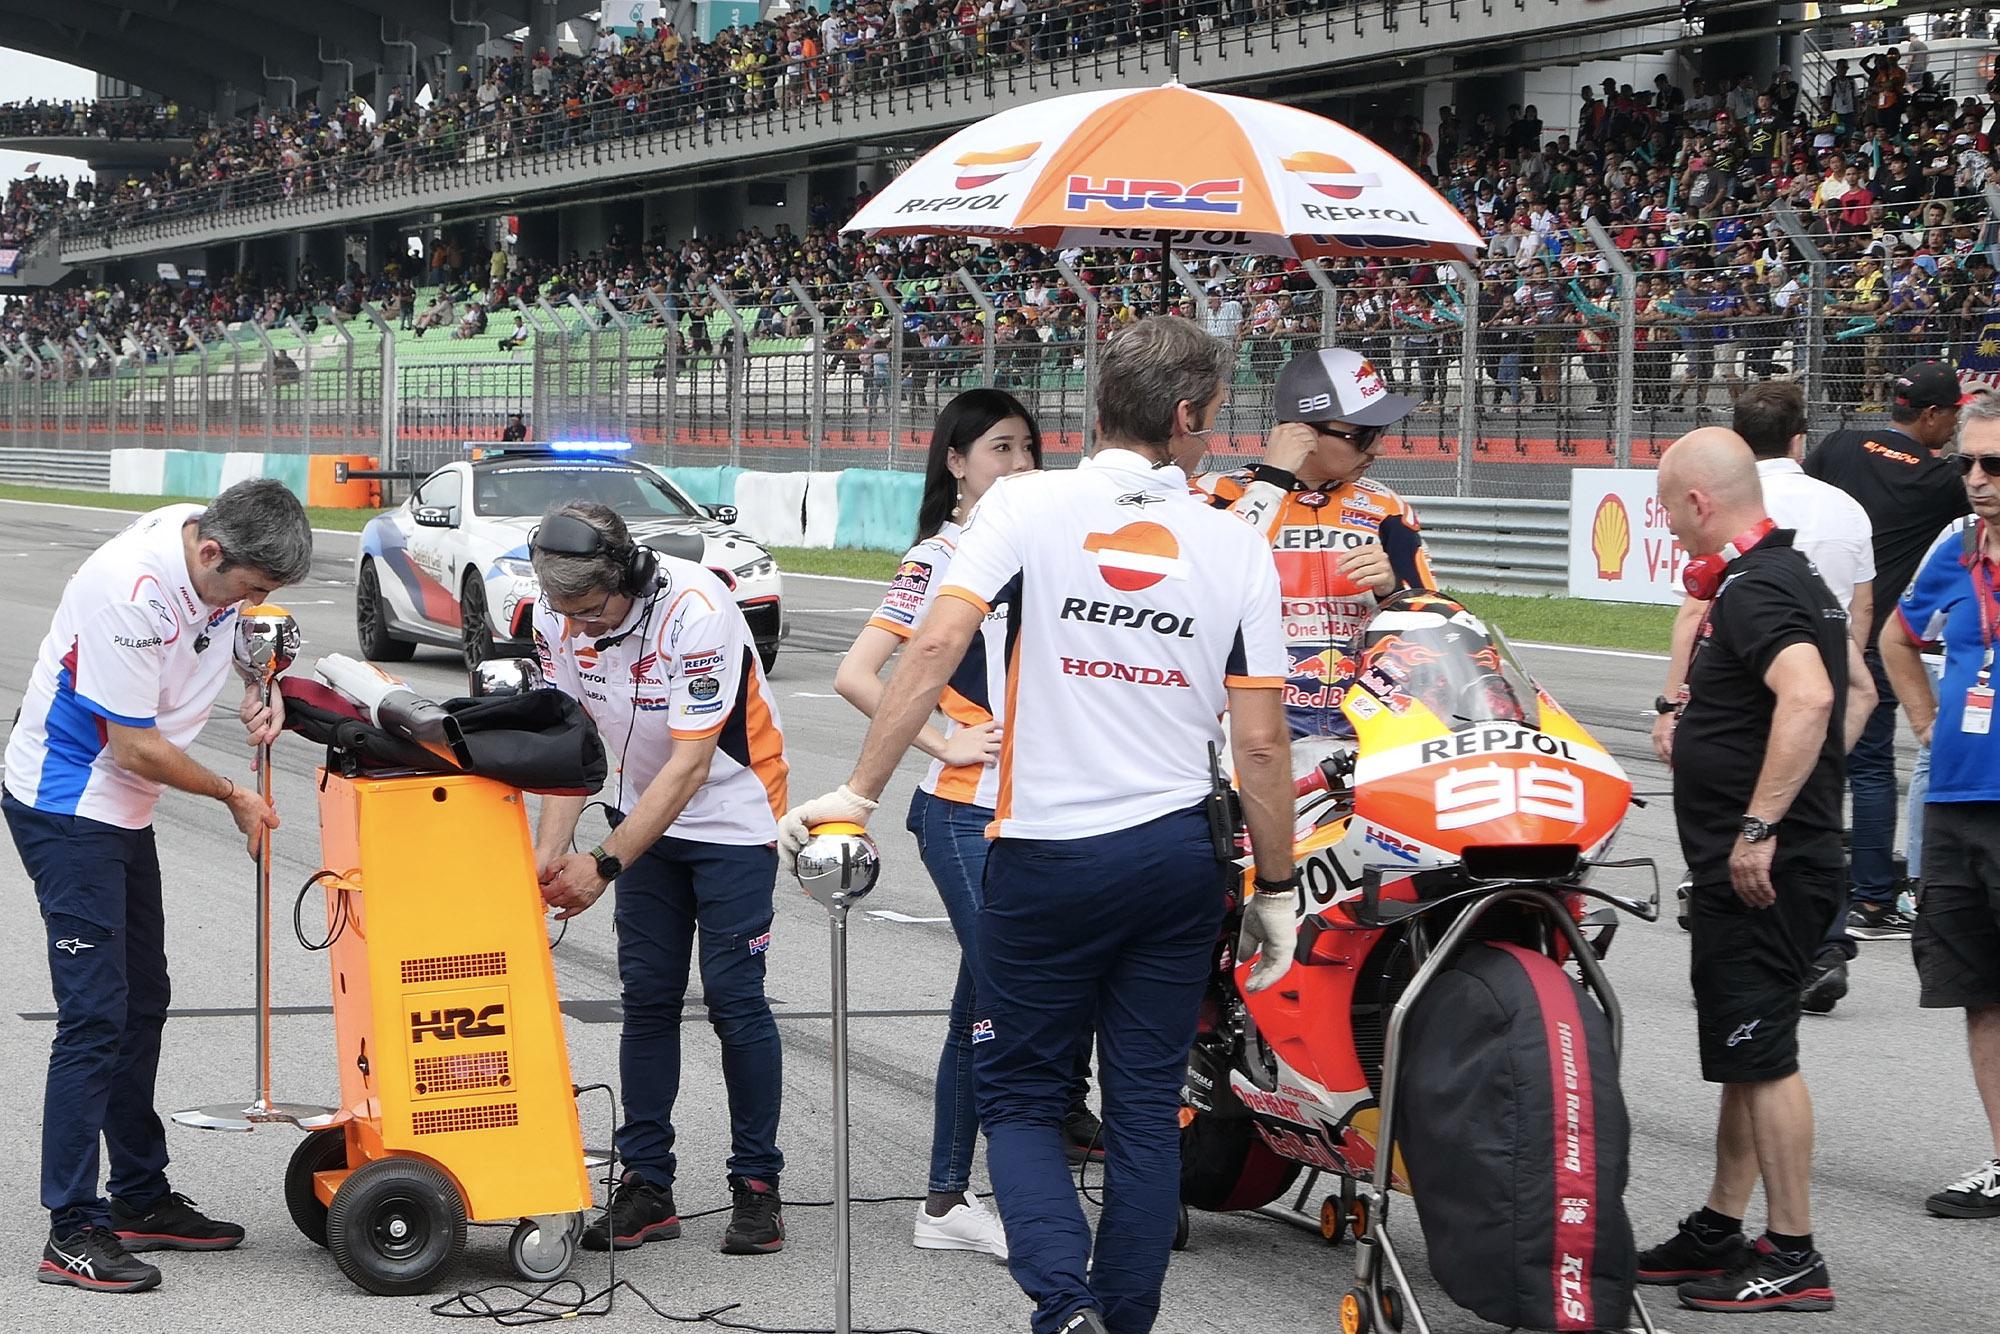 Jorge Lorenzo on the grid at Sepang